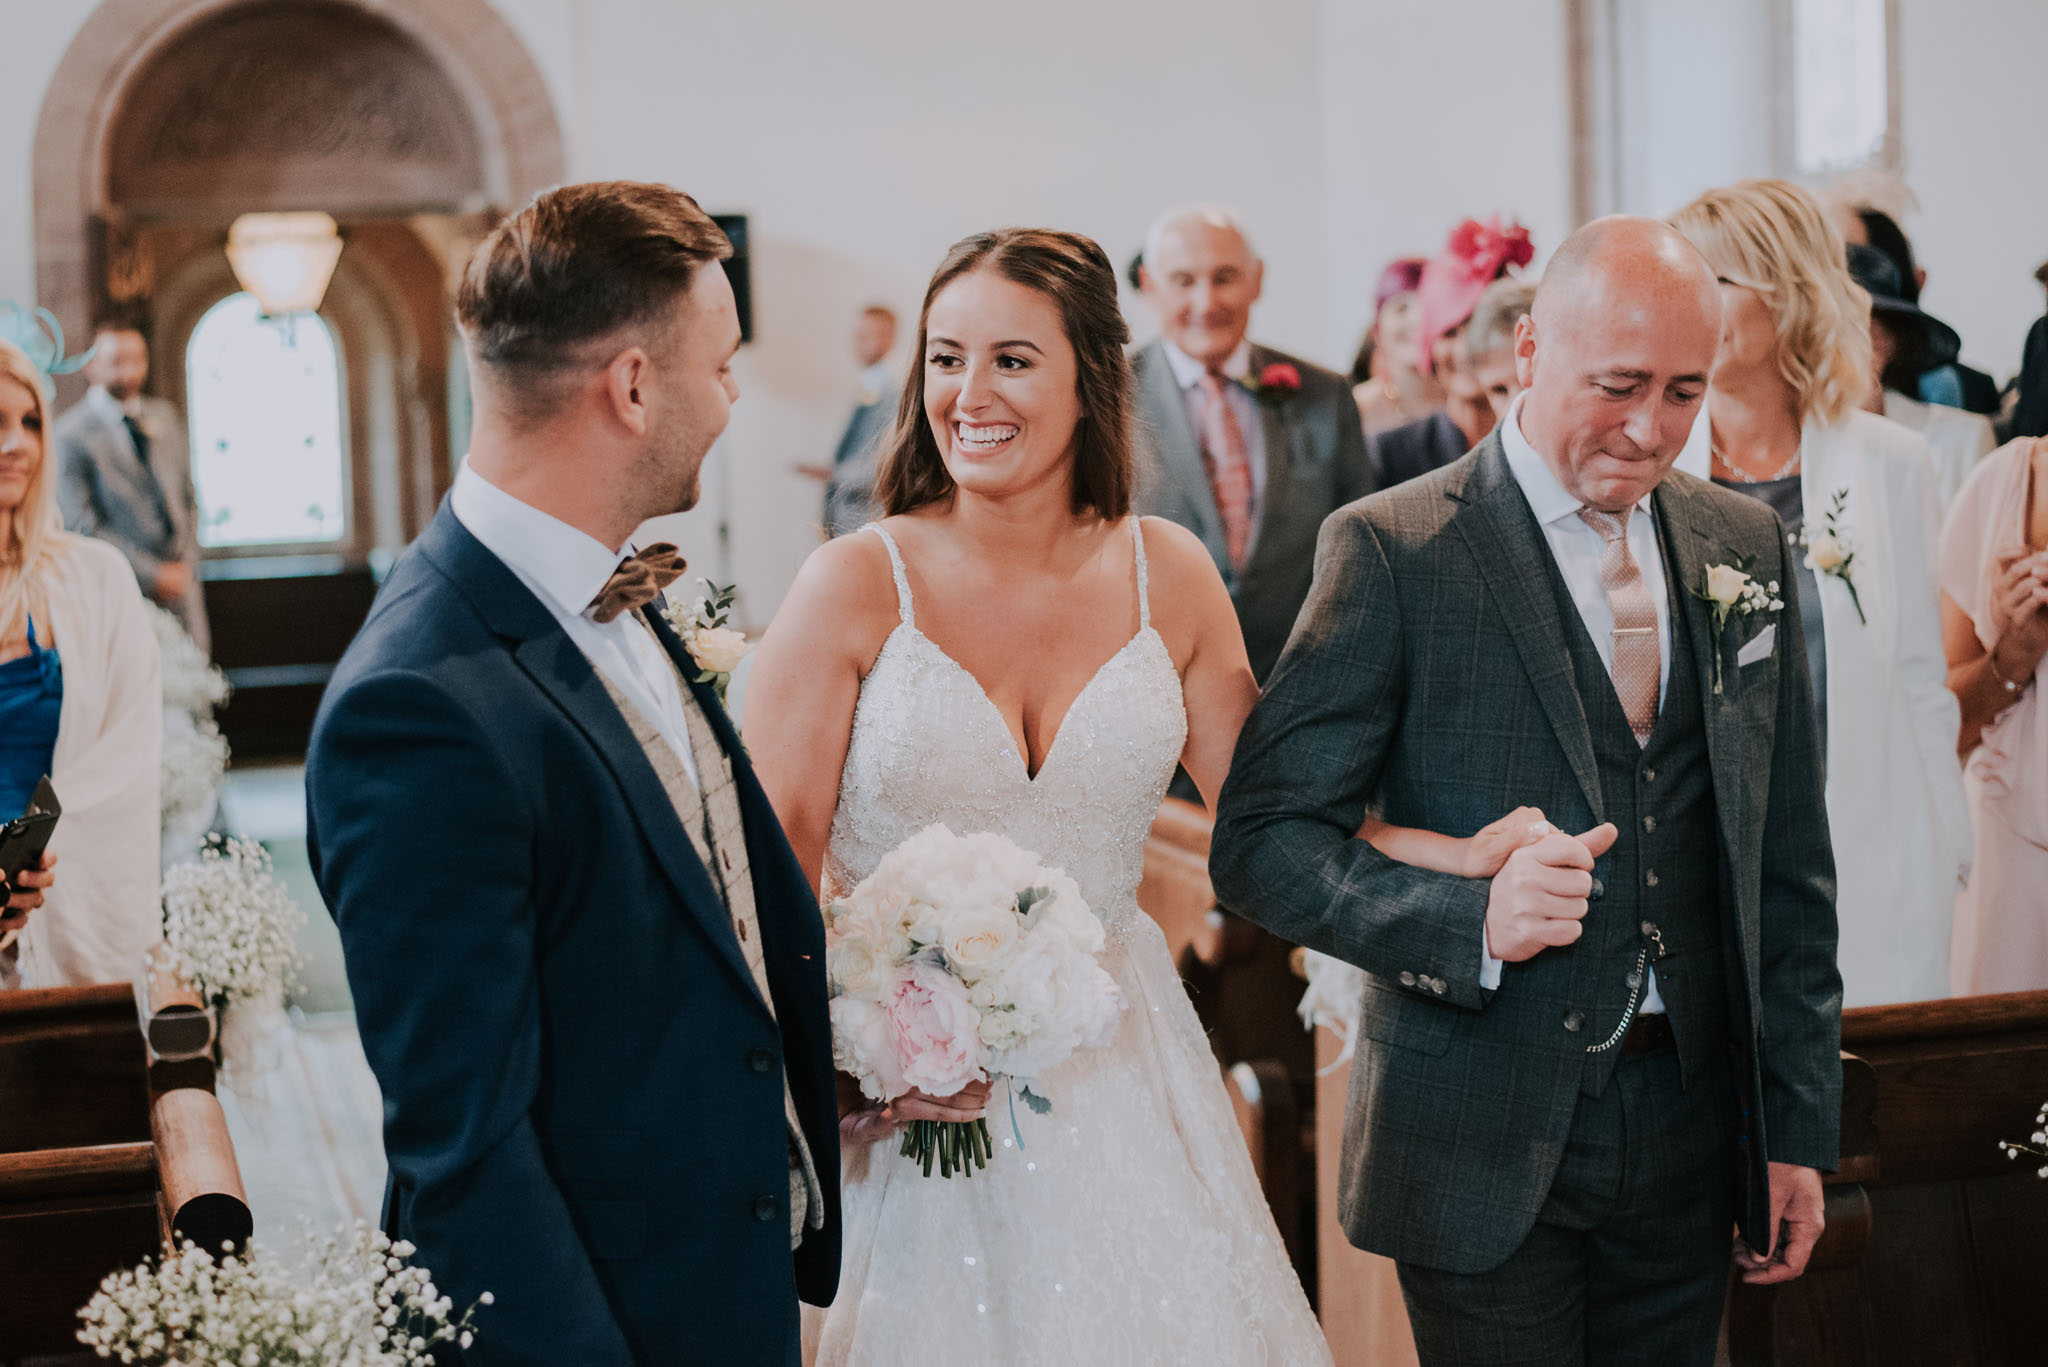 wedding-photographer-glewstone-court-hereford-scott-stockwell-photography168.jpg